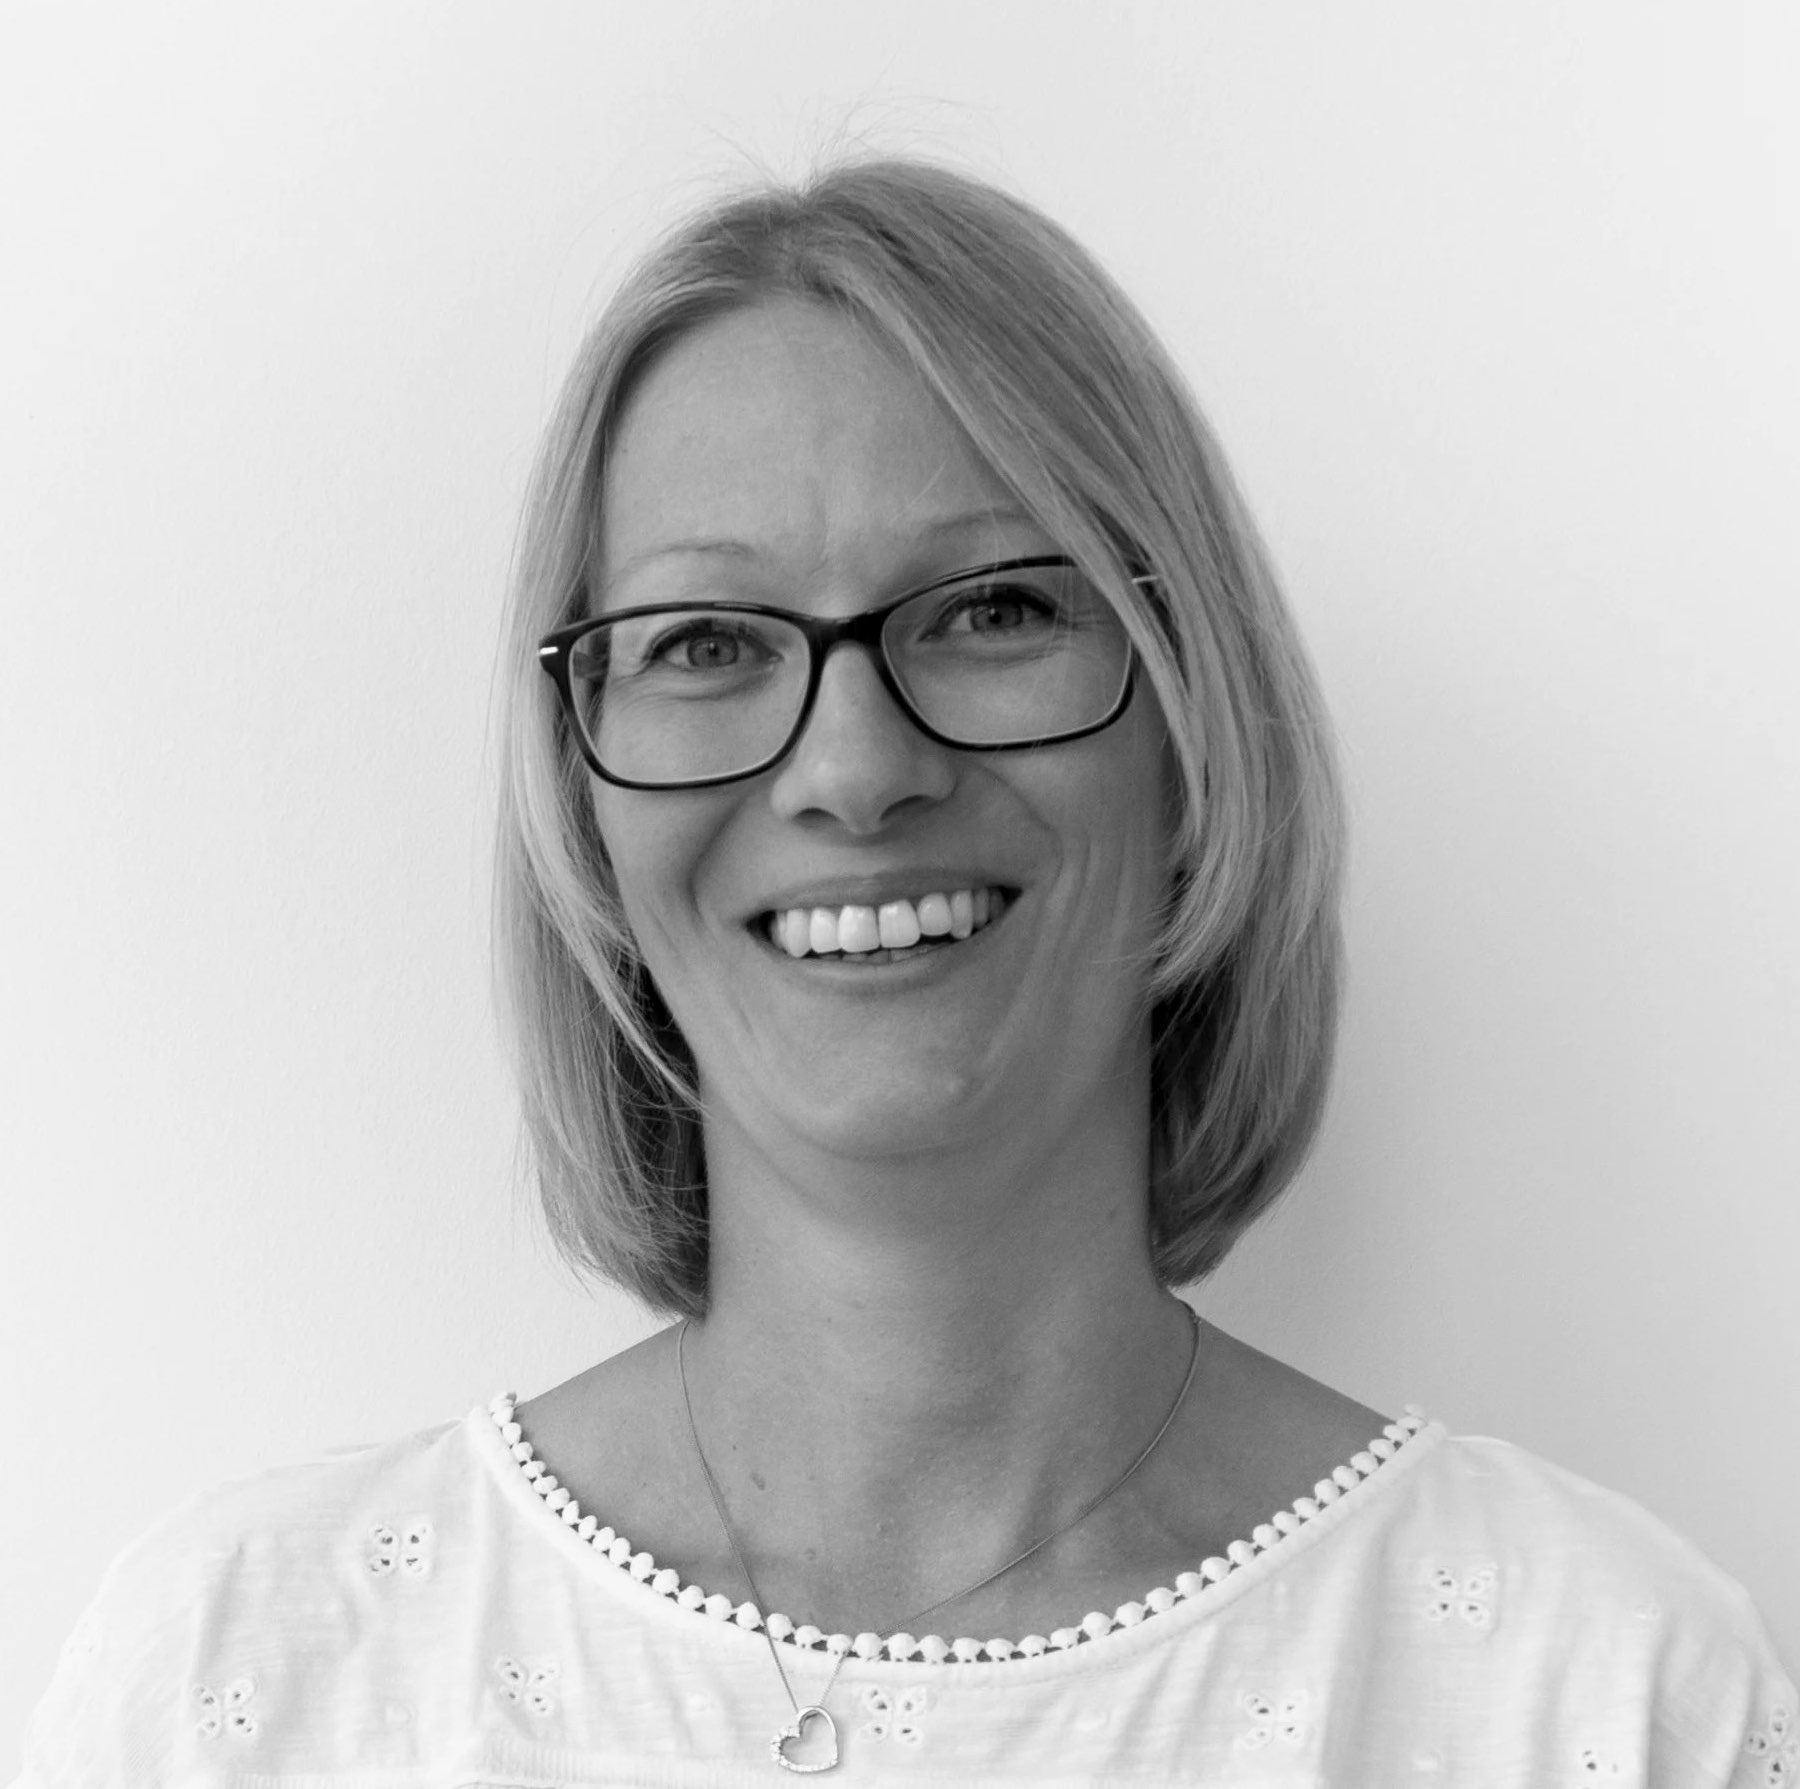 Christine Detzkeit